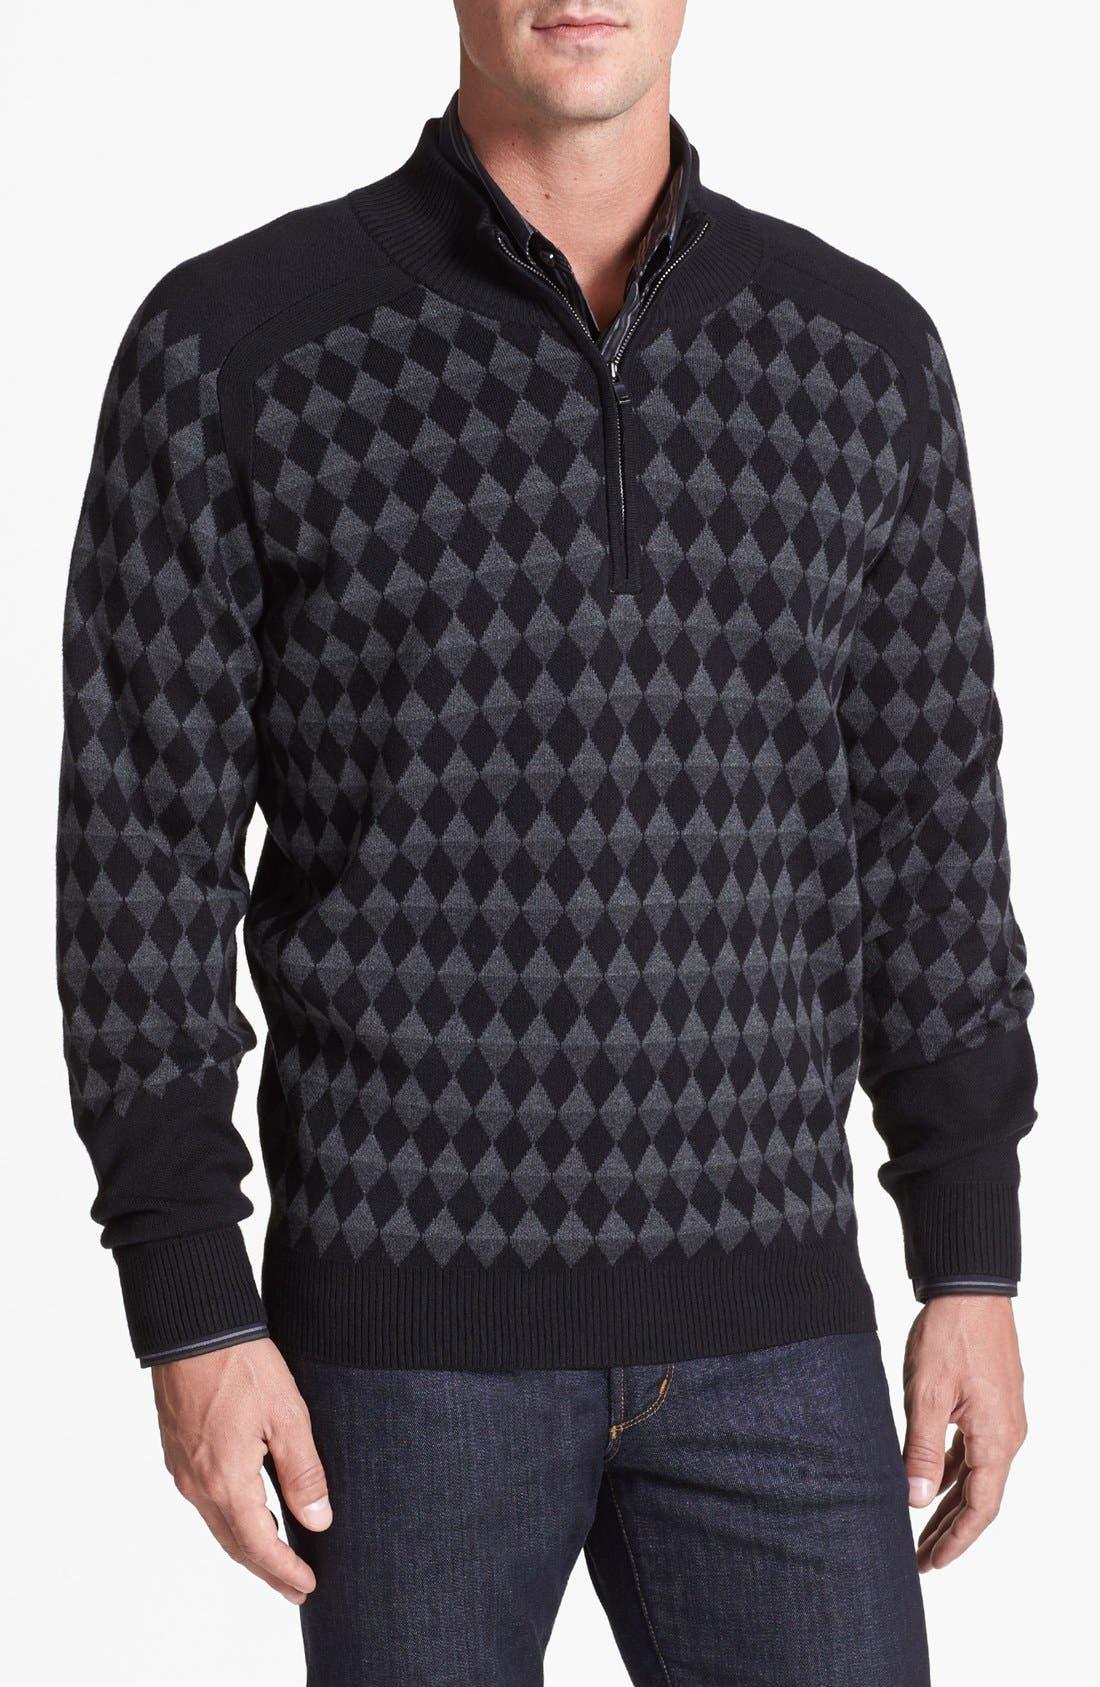 Alternate Image 1 Selected - Cutter & Buck 'Cameo Diamond' Half Zip Sweater